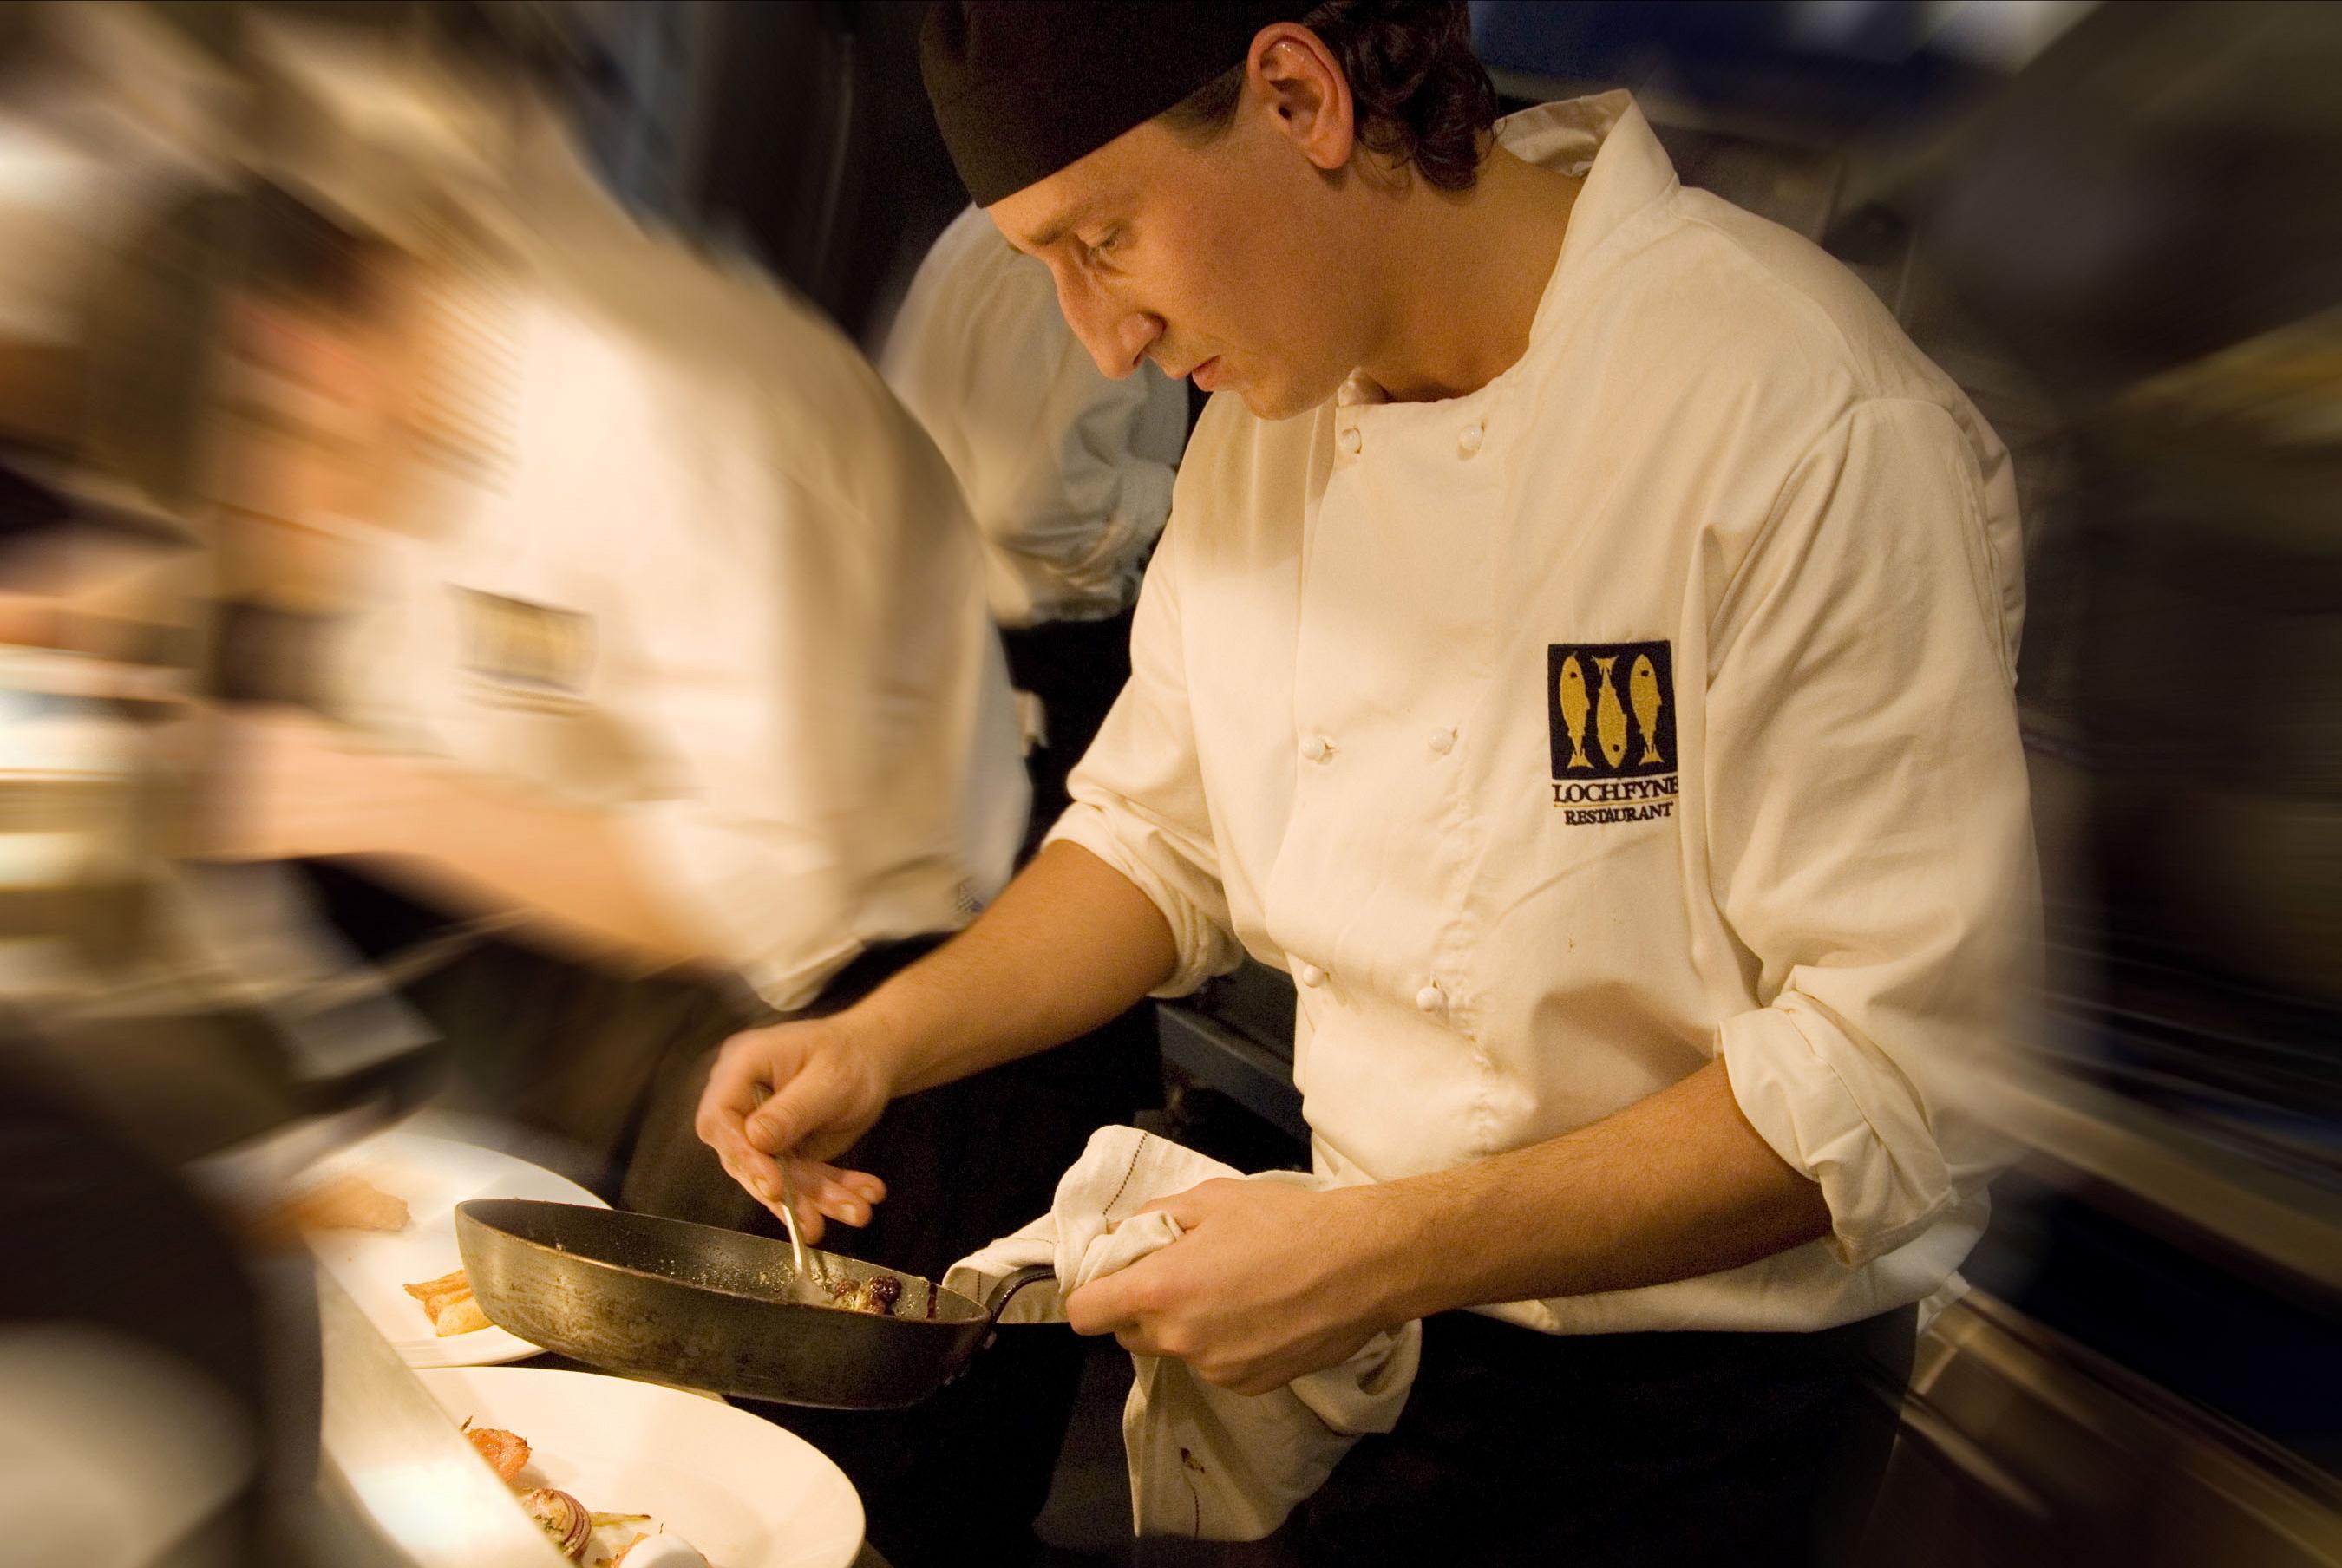 A chef at a Loch Fyne restaurant.